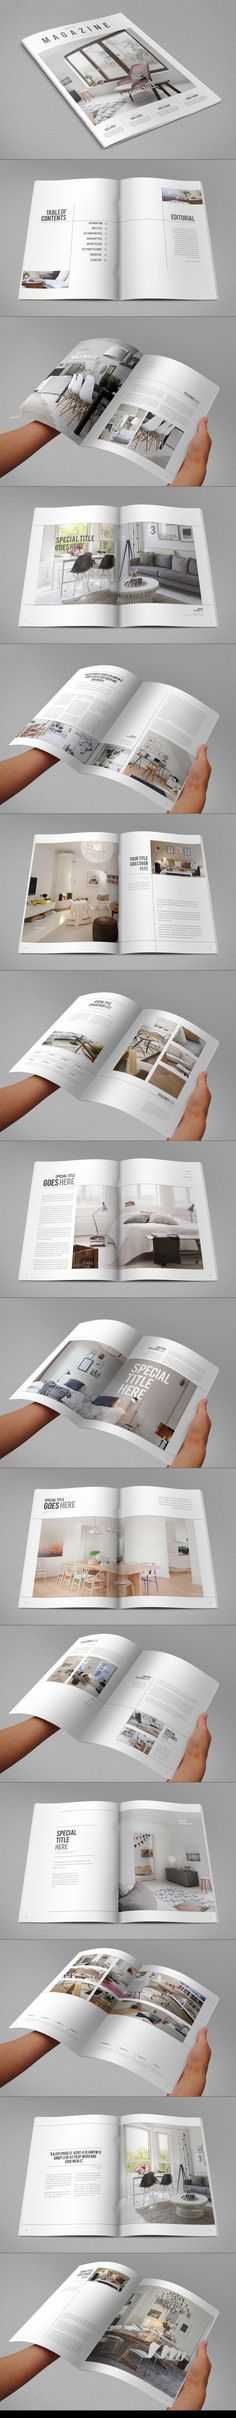 Magazine design layout and design